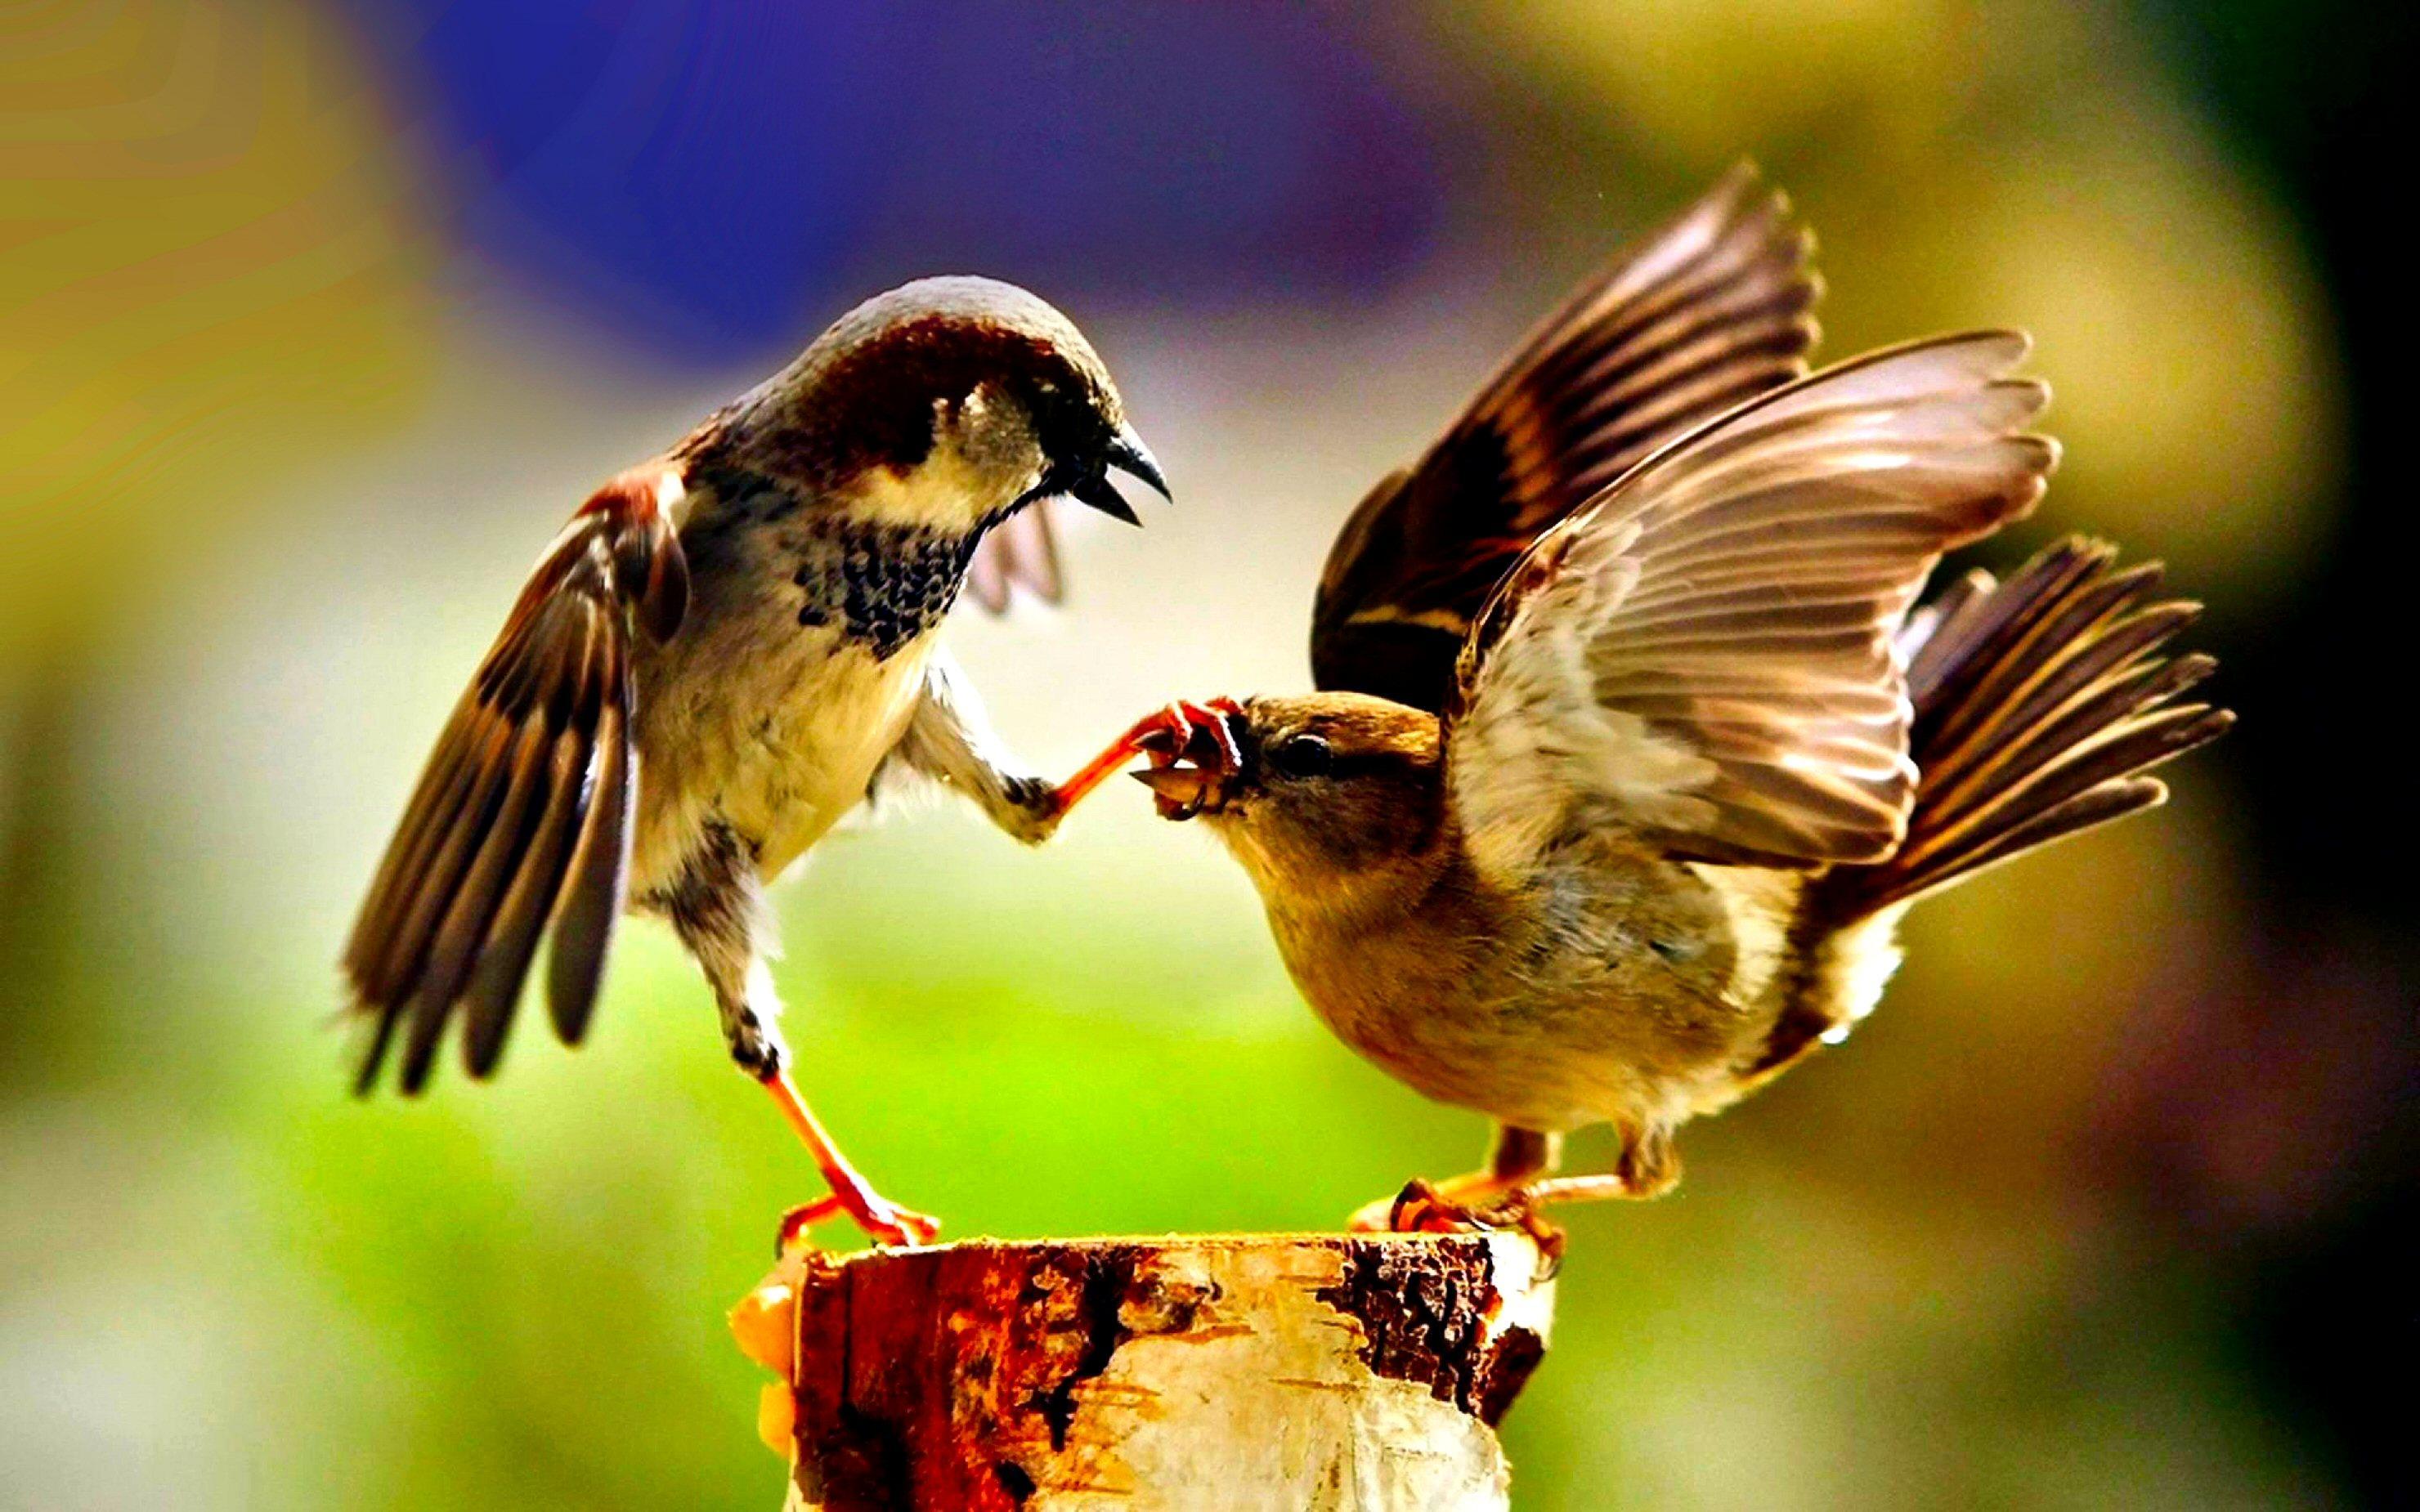 بالصور صور بلابل , صور طيور جميله 3922 6